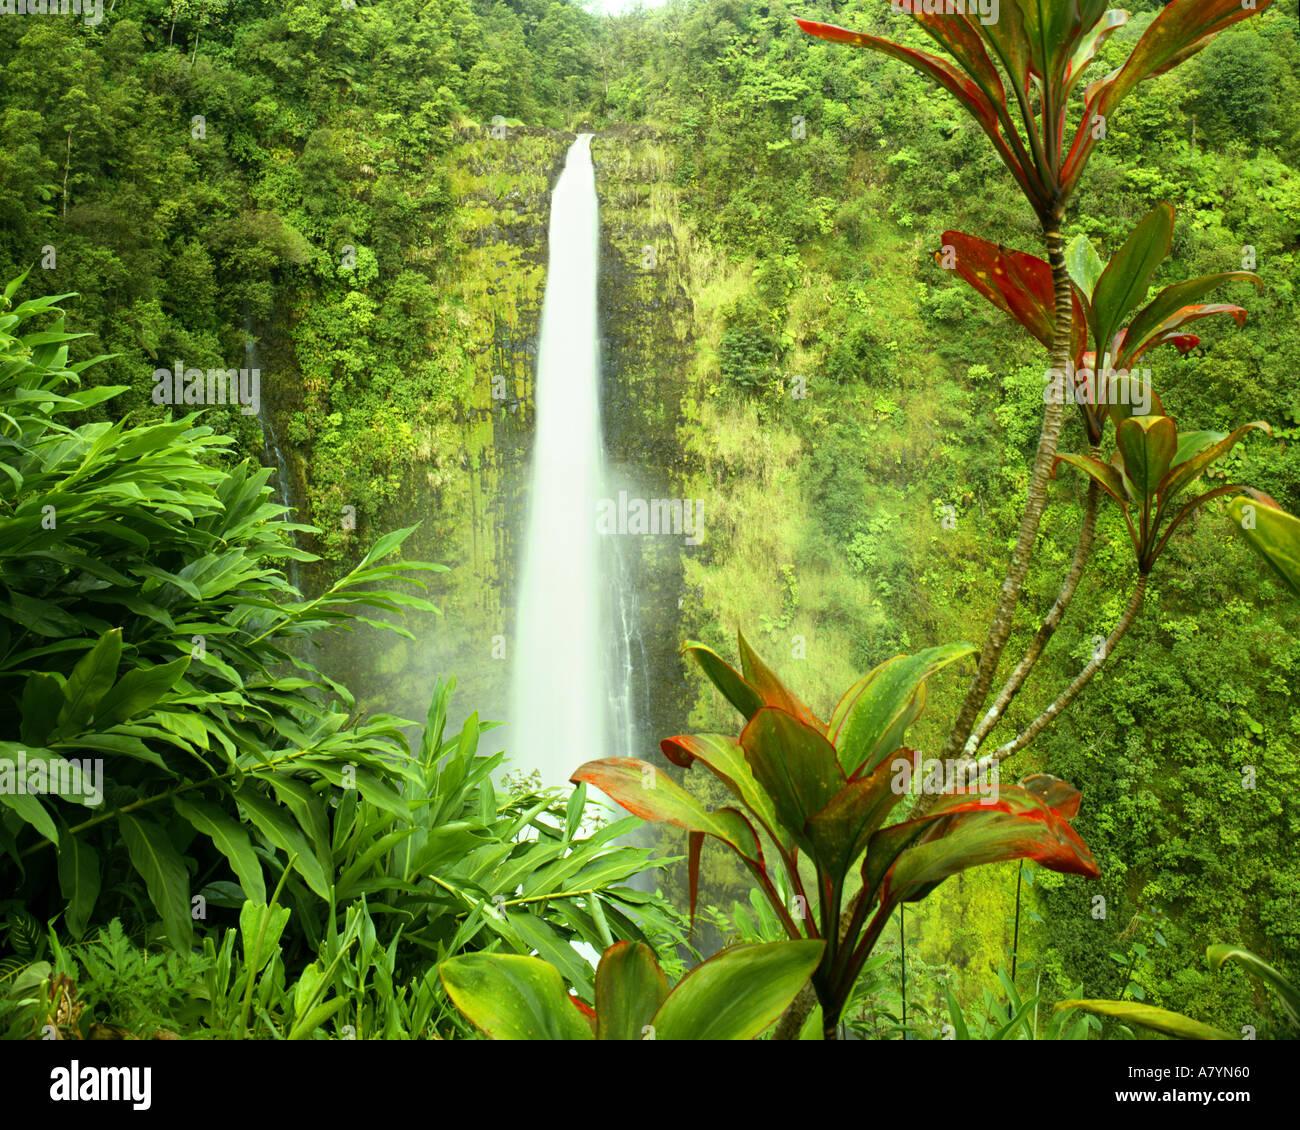 USA - HAWAII: Akaka Falls on Big Island - Stock Image